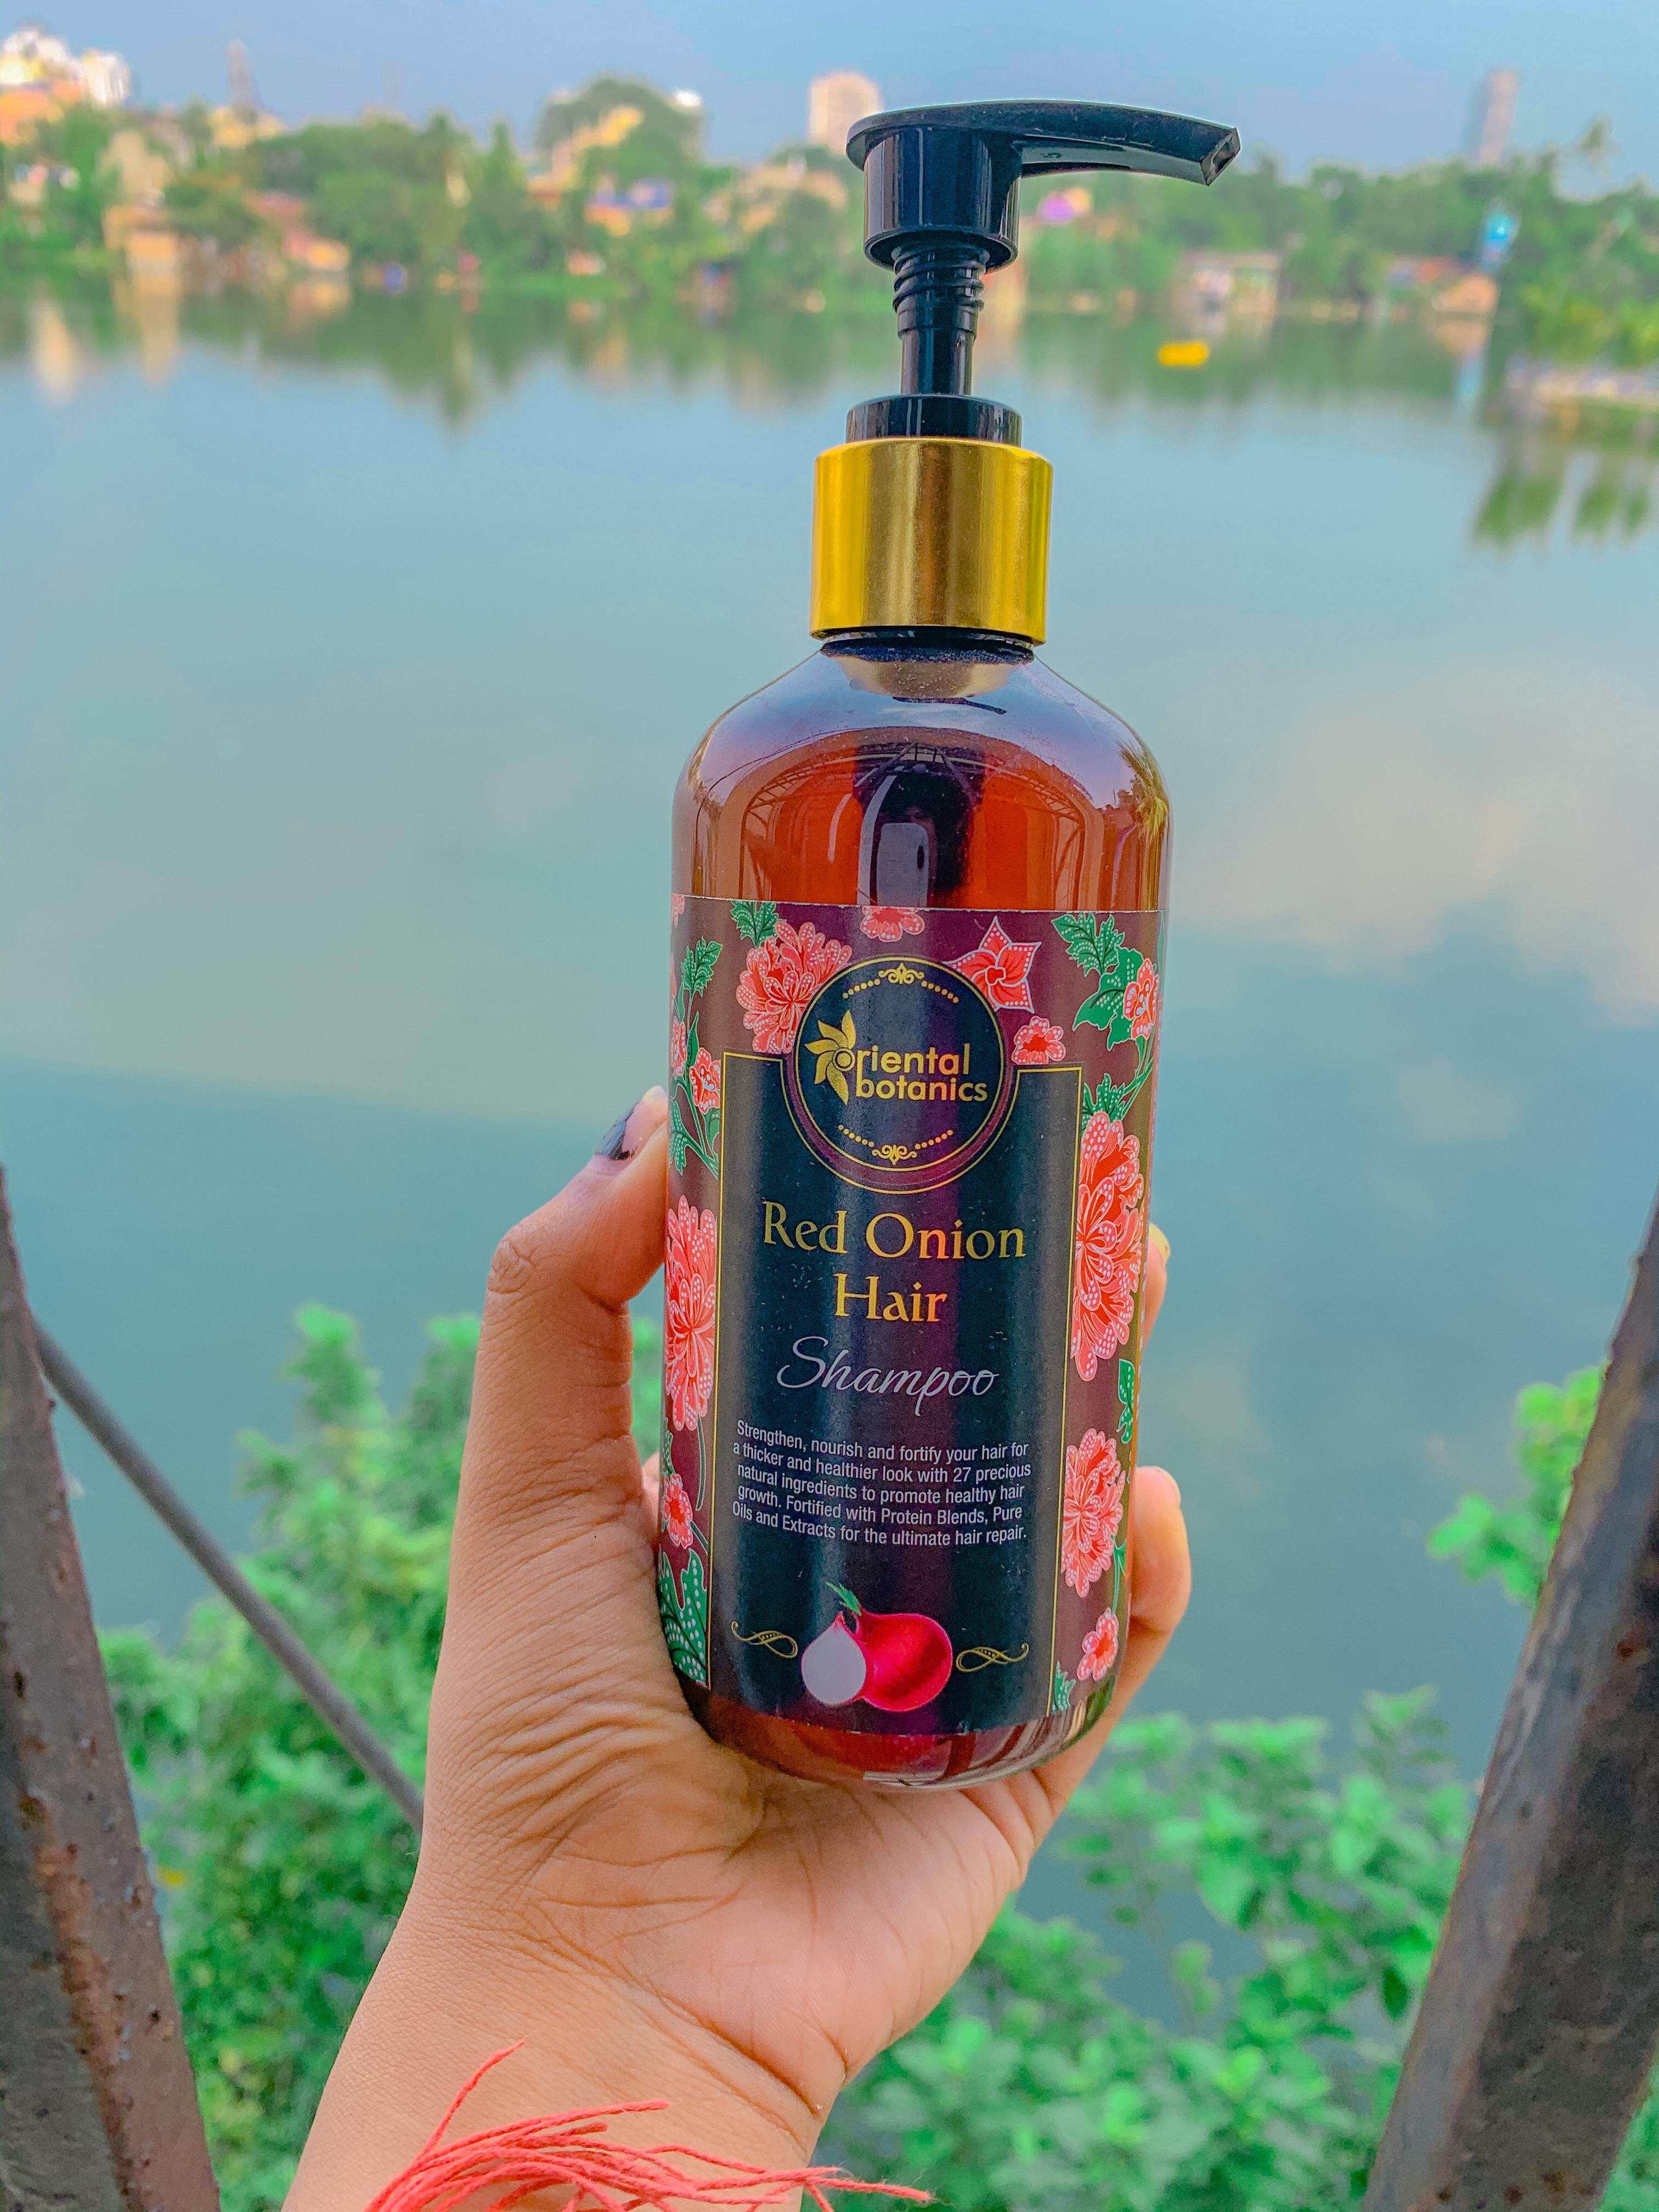 Oriental Botanics Red Onion Hair Shampoo pic 1-Adds volume to hair-By arunikakoley